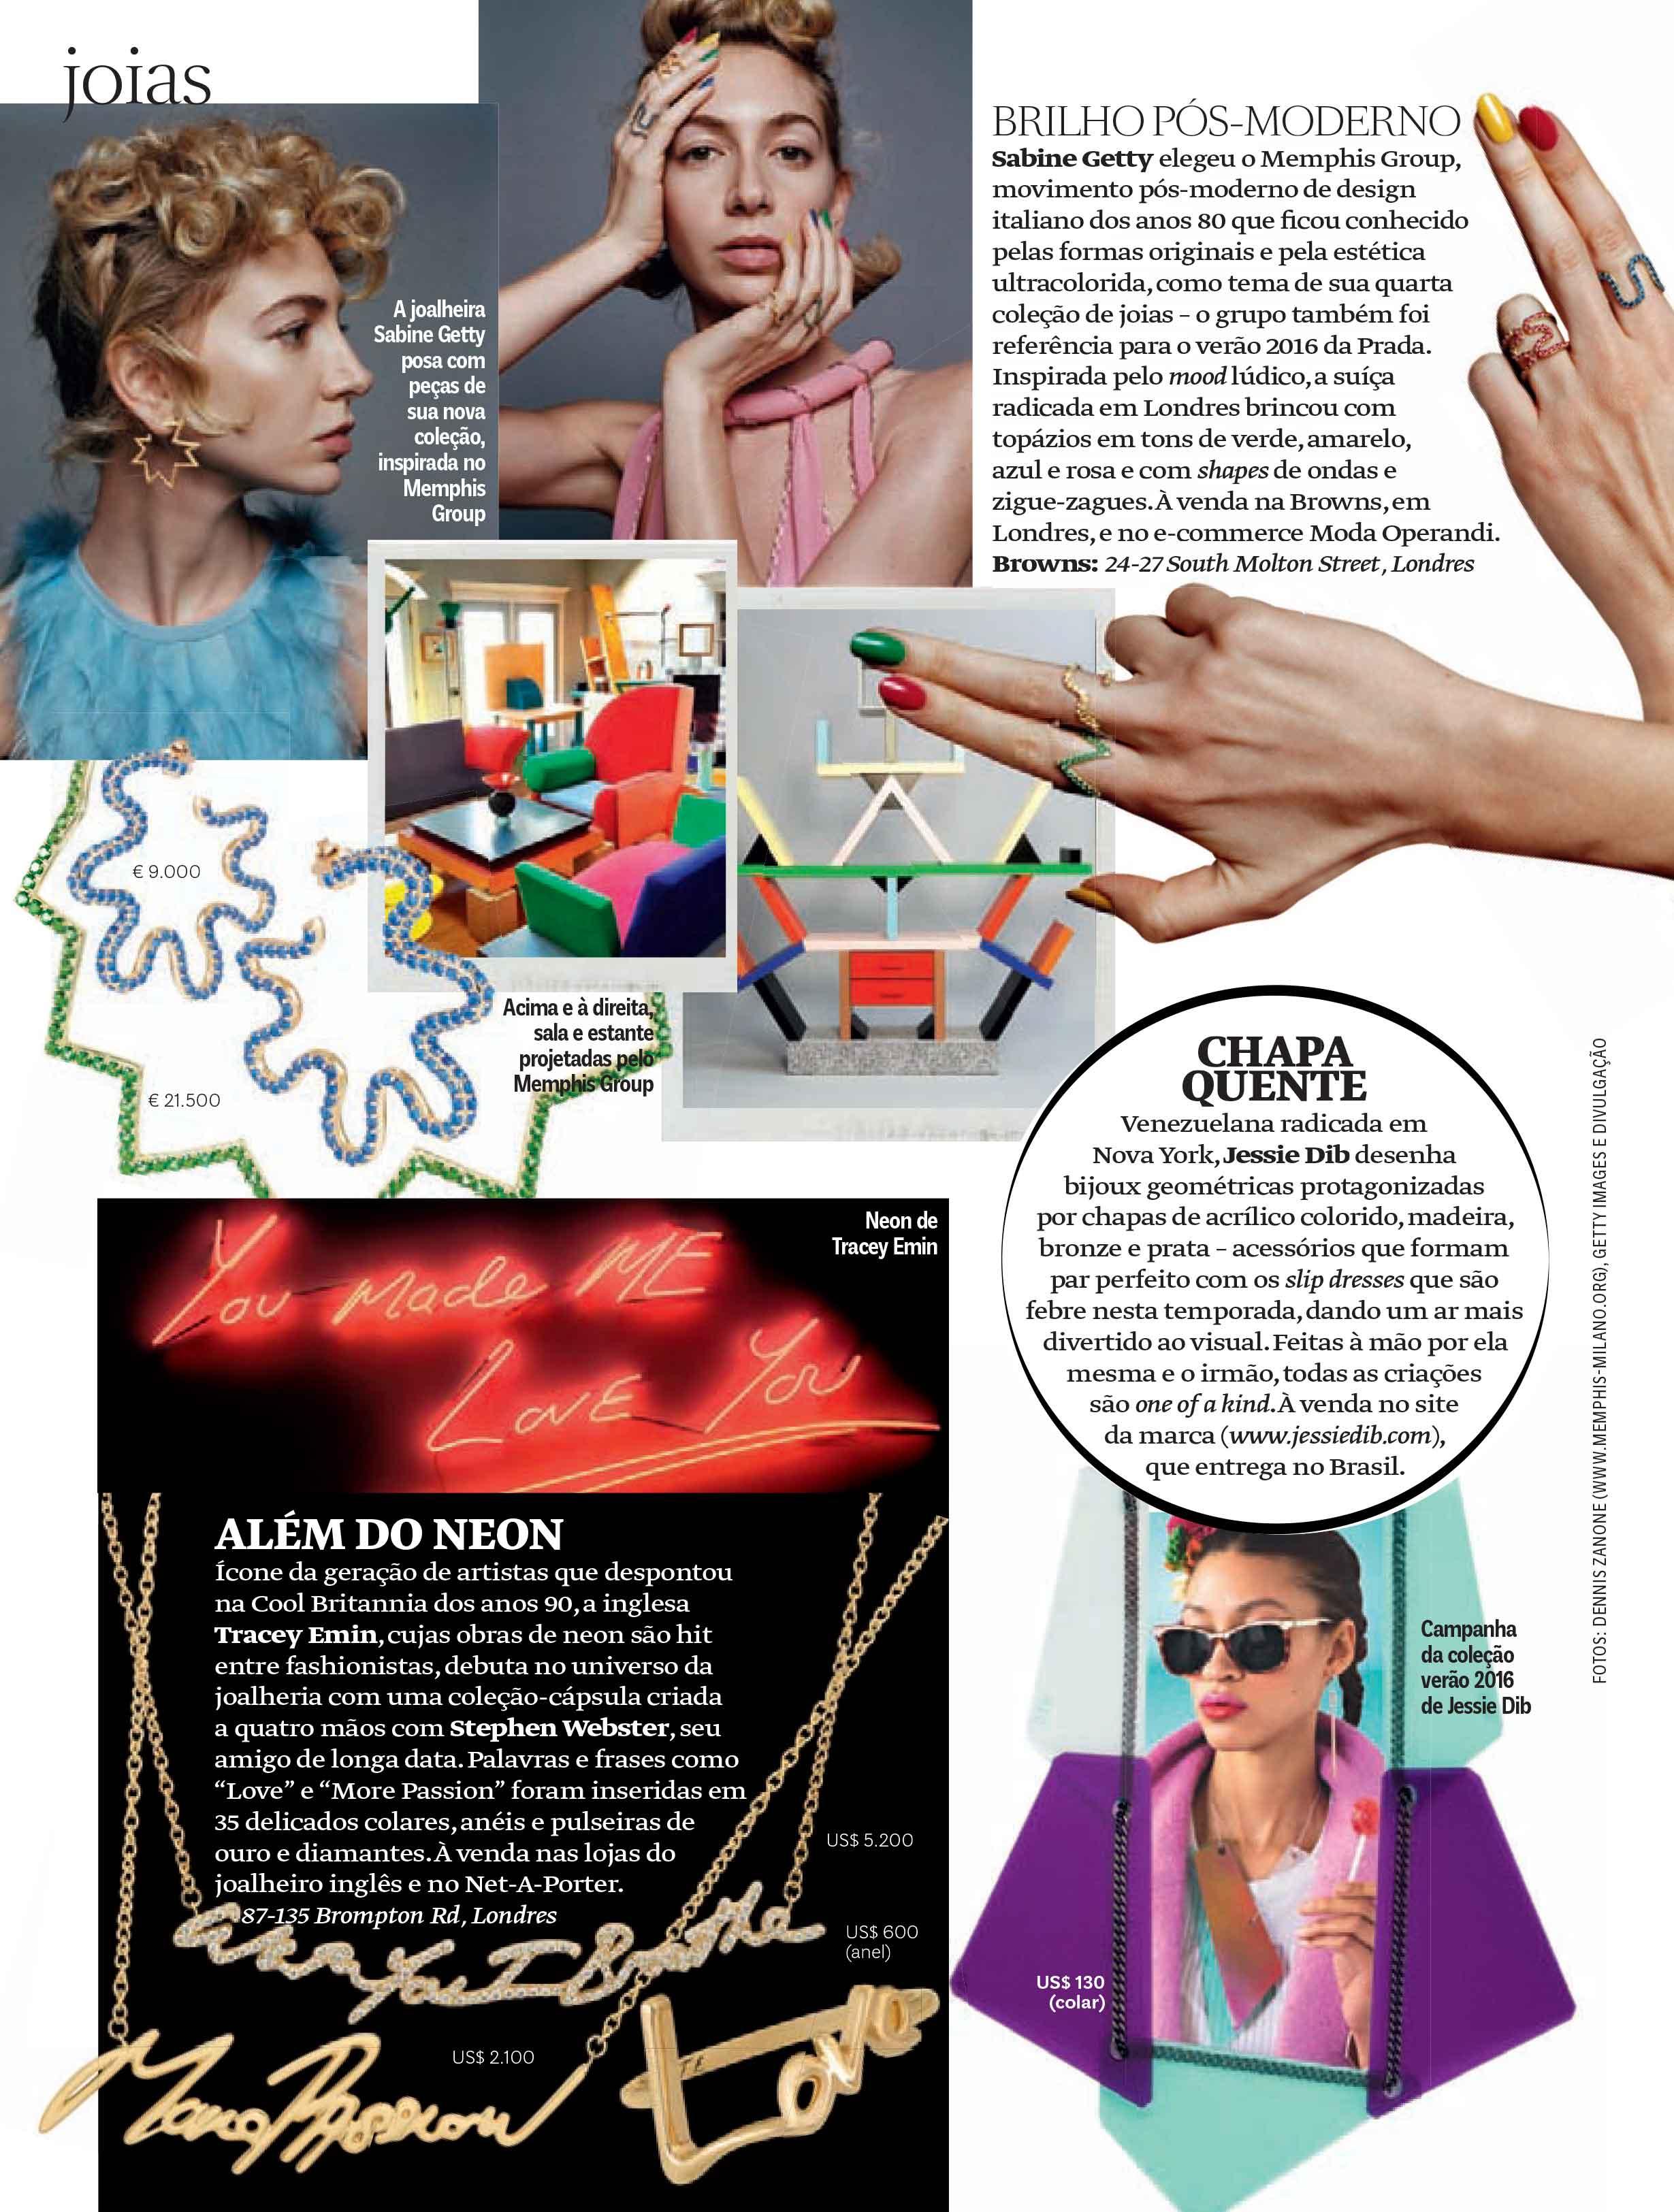 Jessie-Dib-Press-Vogue-Brazil-March-2016-feature